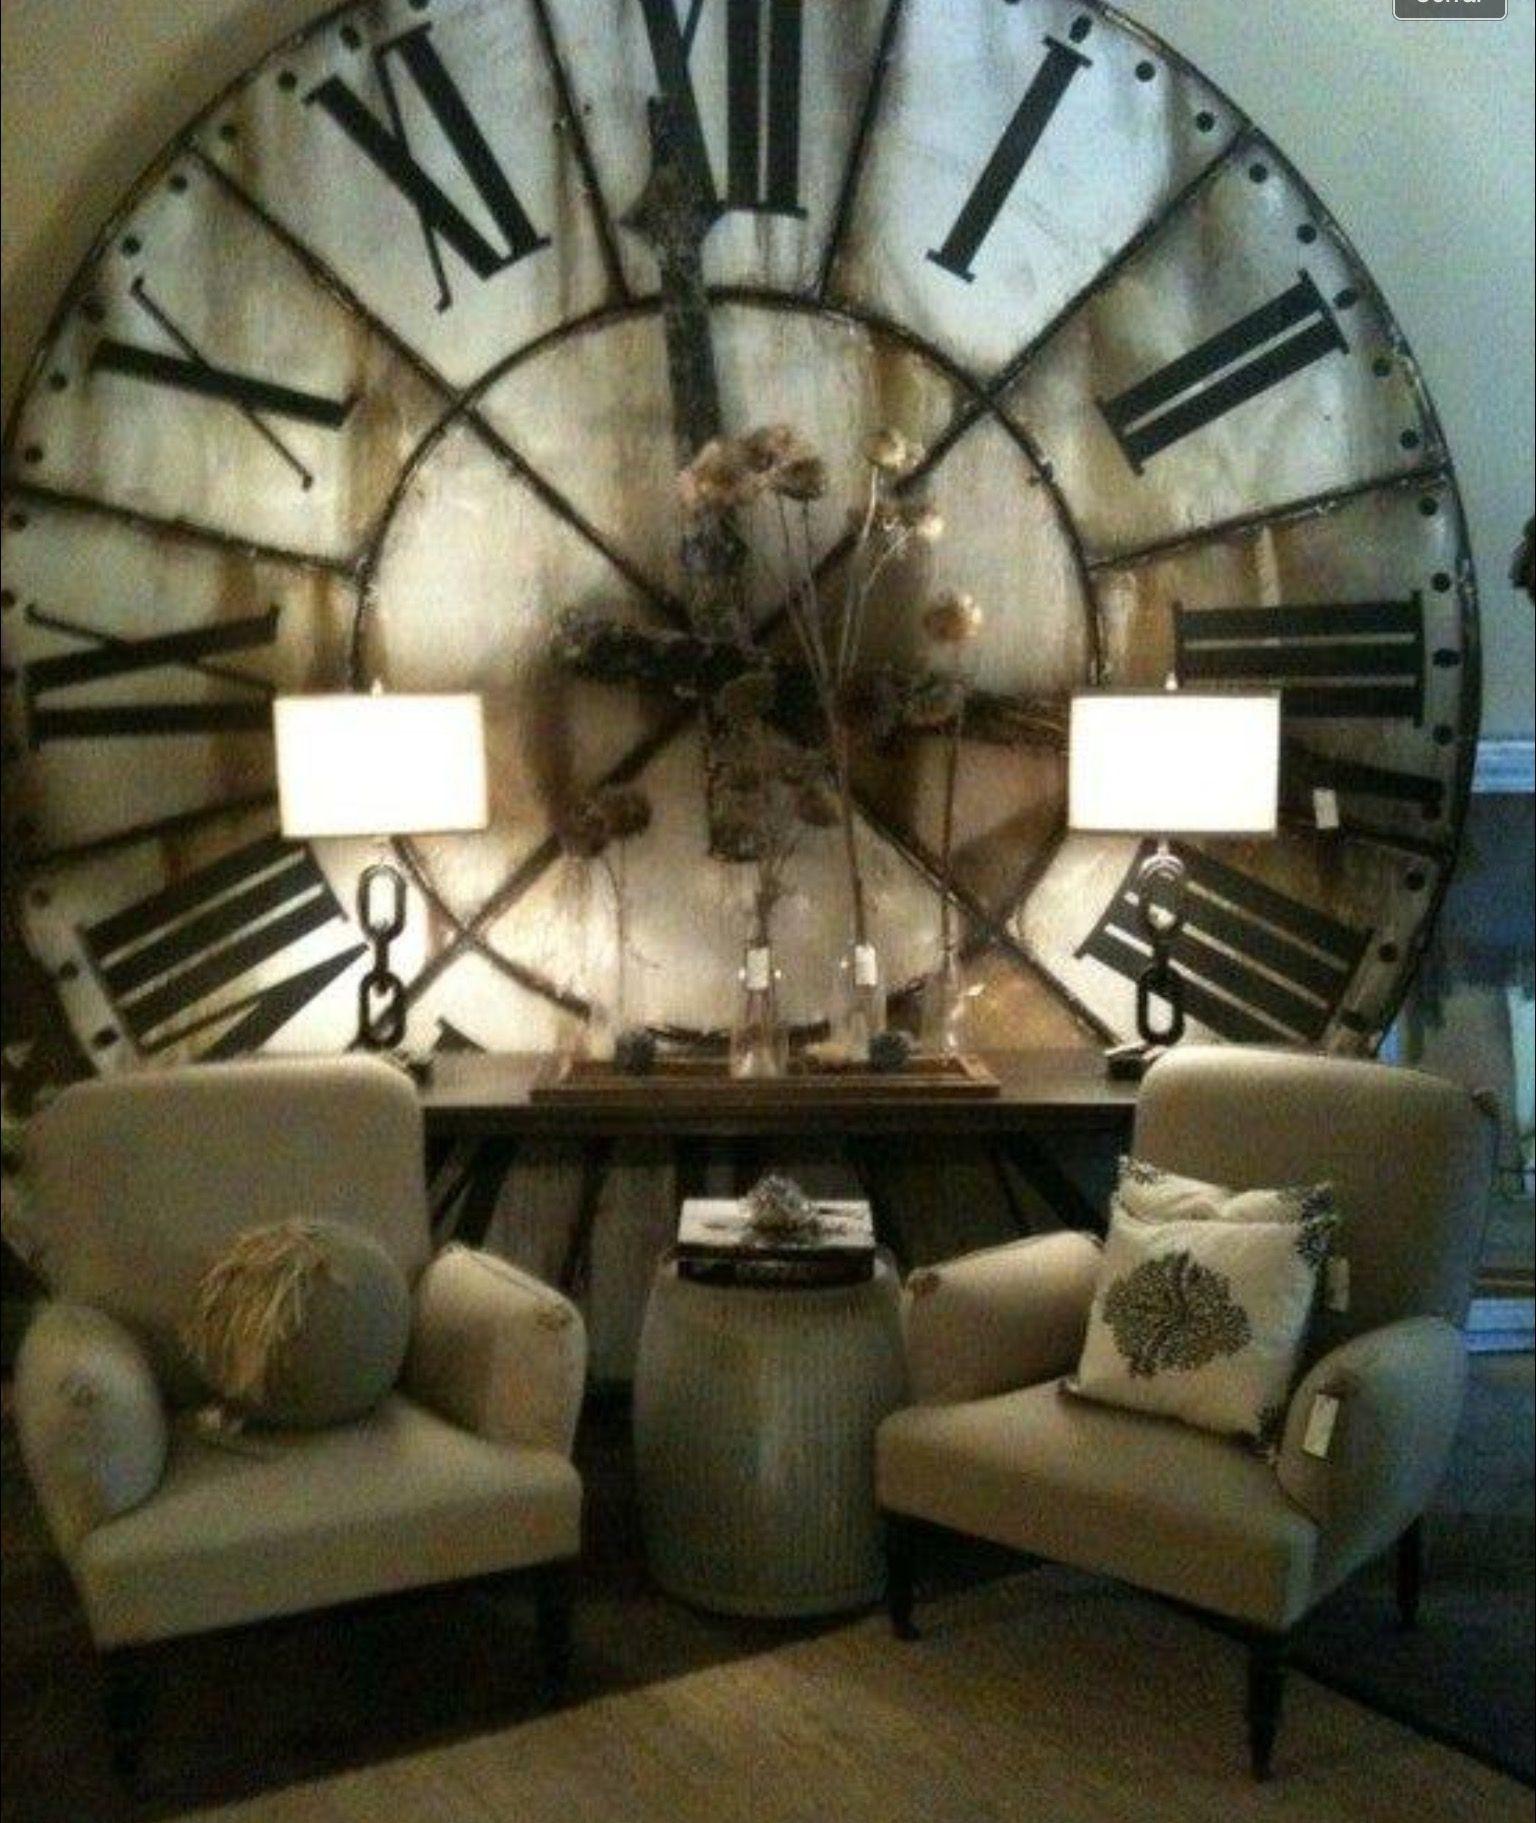 Merveilleux Over Sized Wall Clocks 8